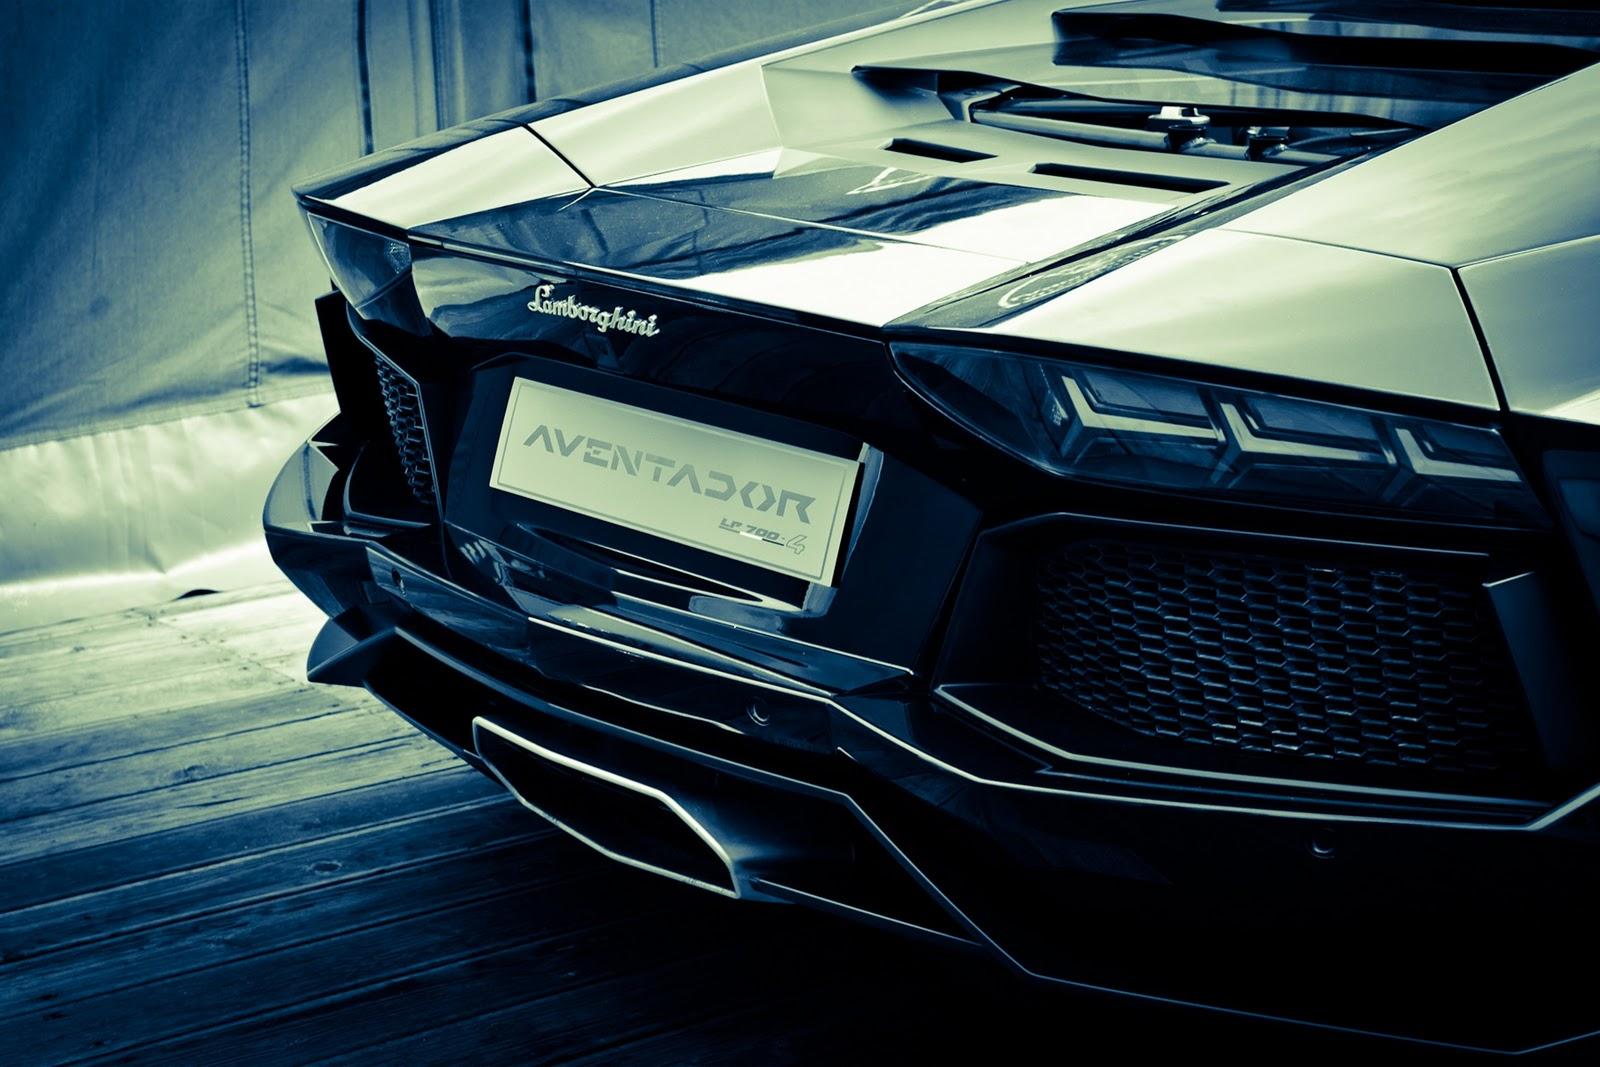 Fondo de Pantalla de la parte de atras de un Lamborghini